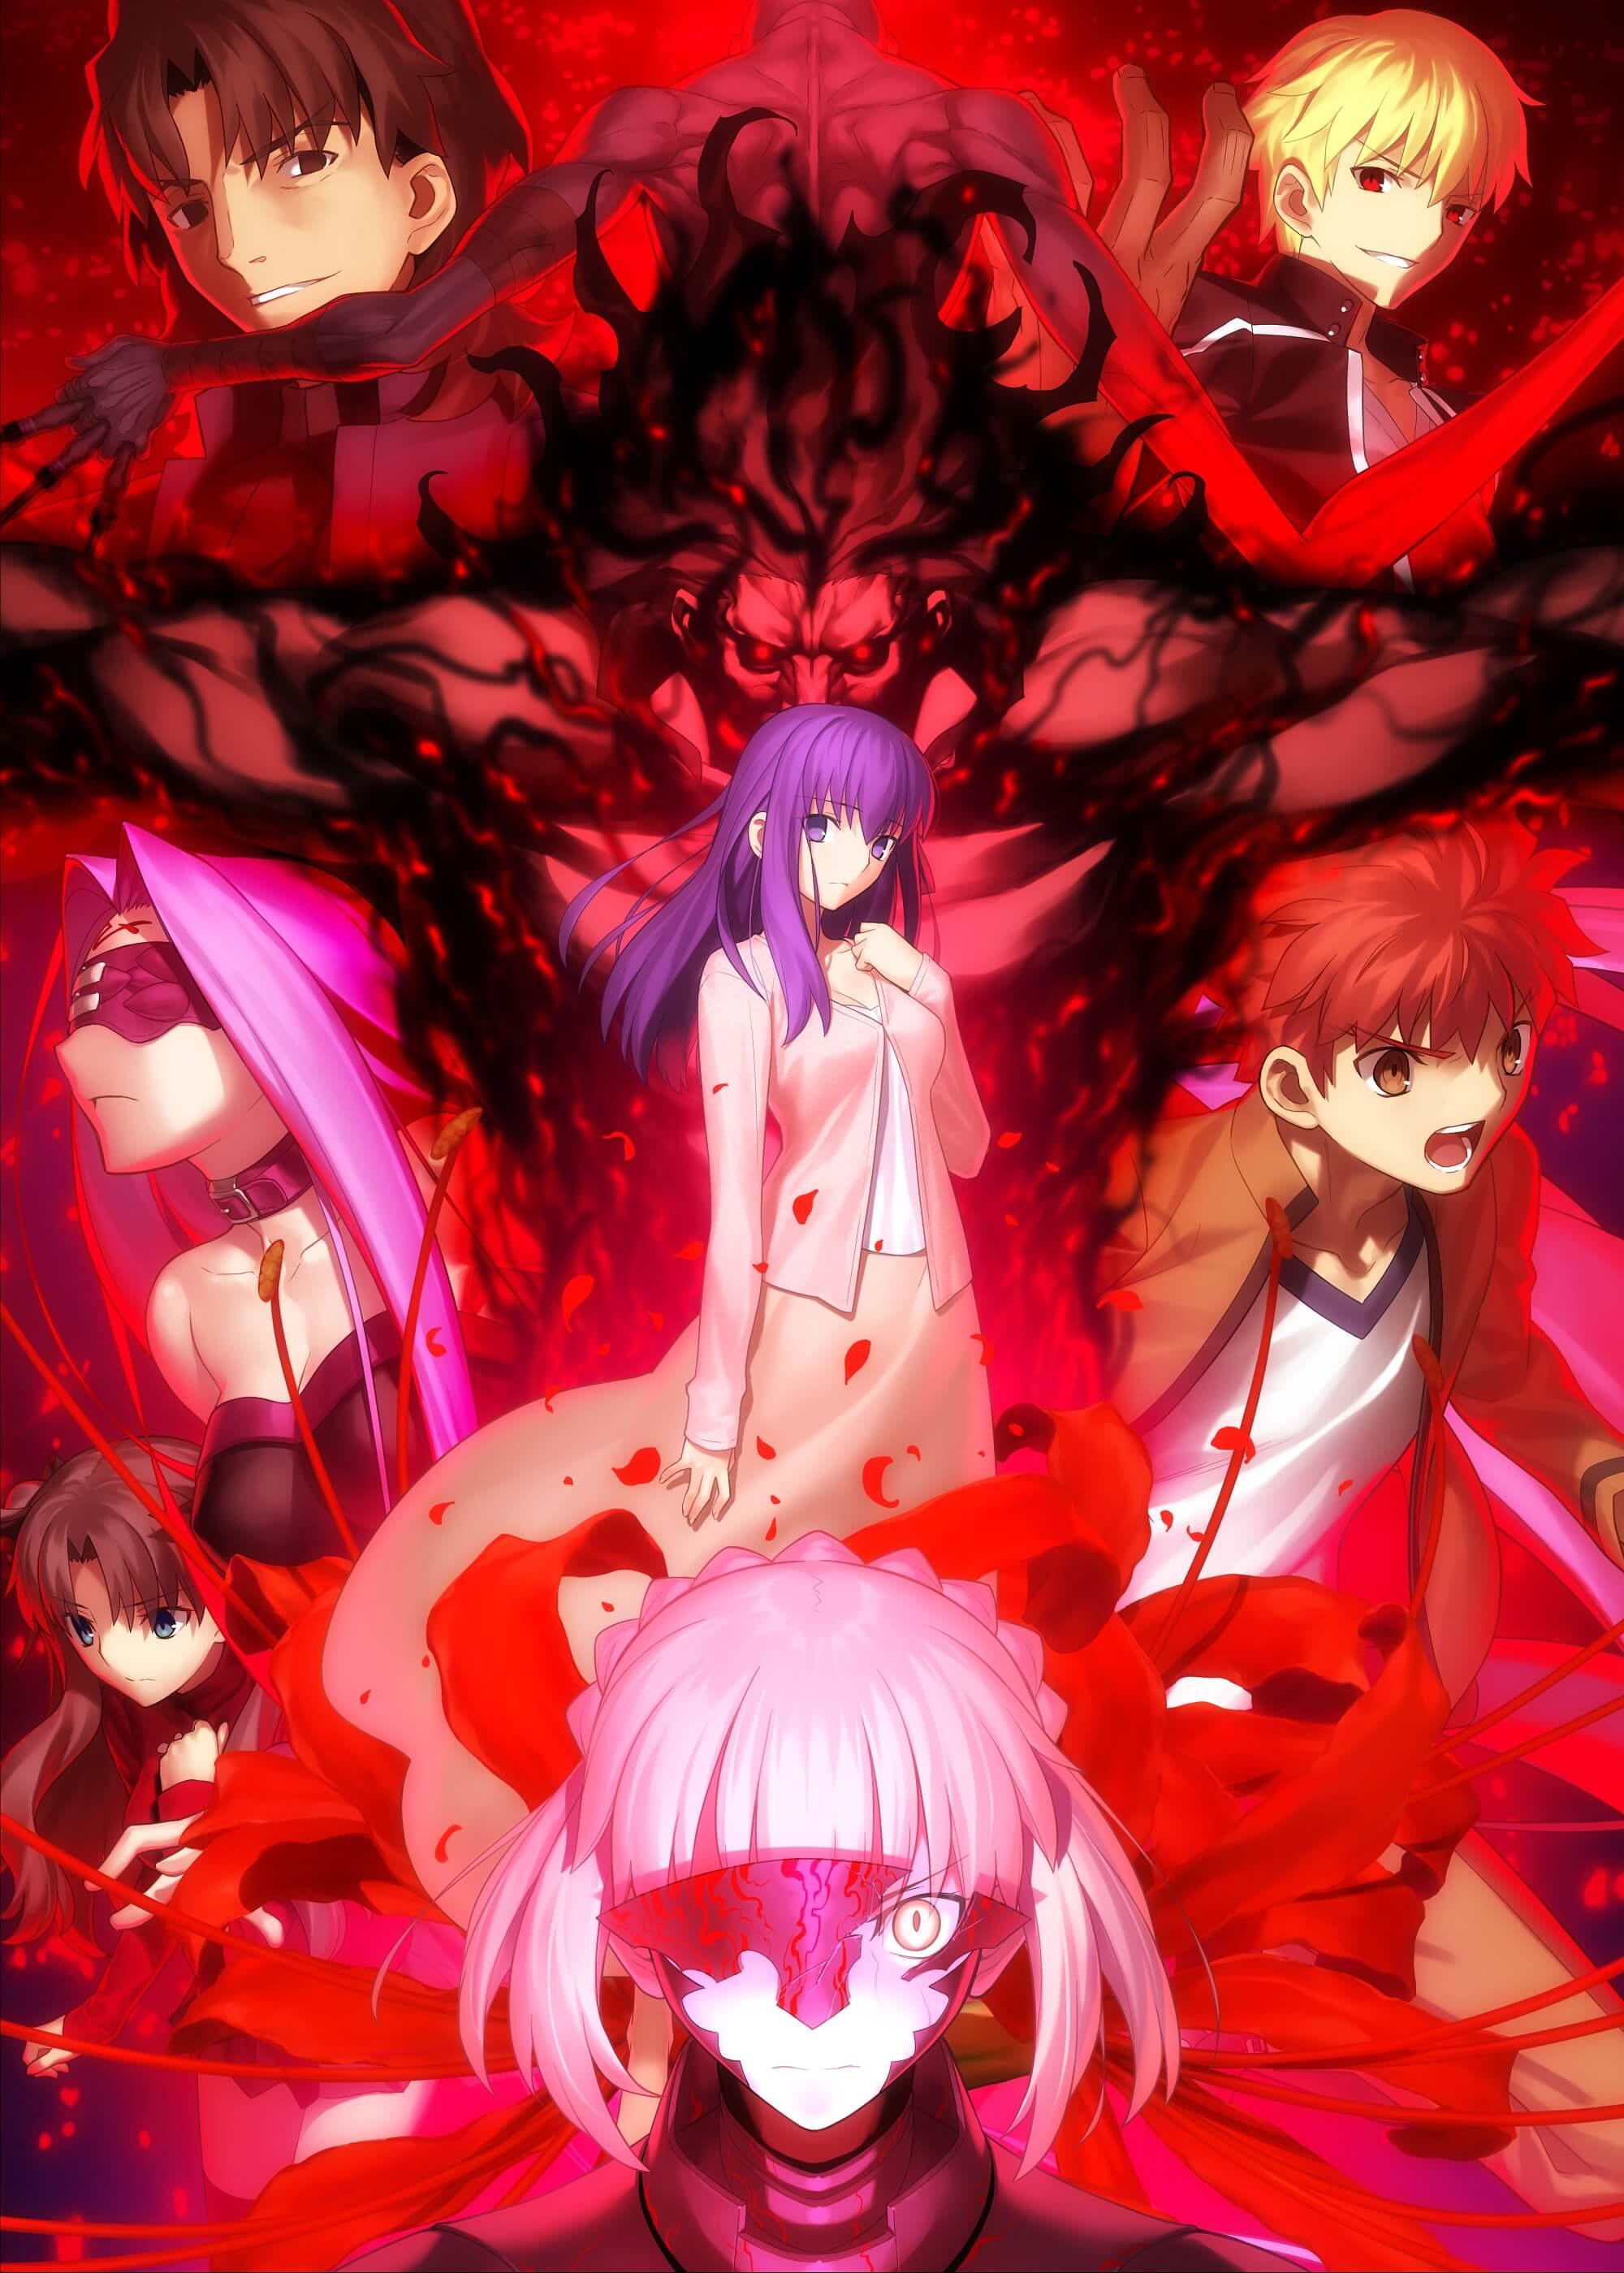 劇場版《Fate/stay night [Heaven's Feel] II.lost butterfly》角色原案主視覺公開! Fate_、